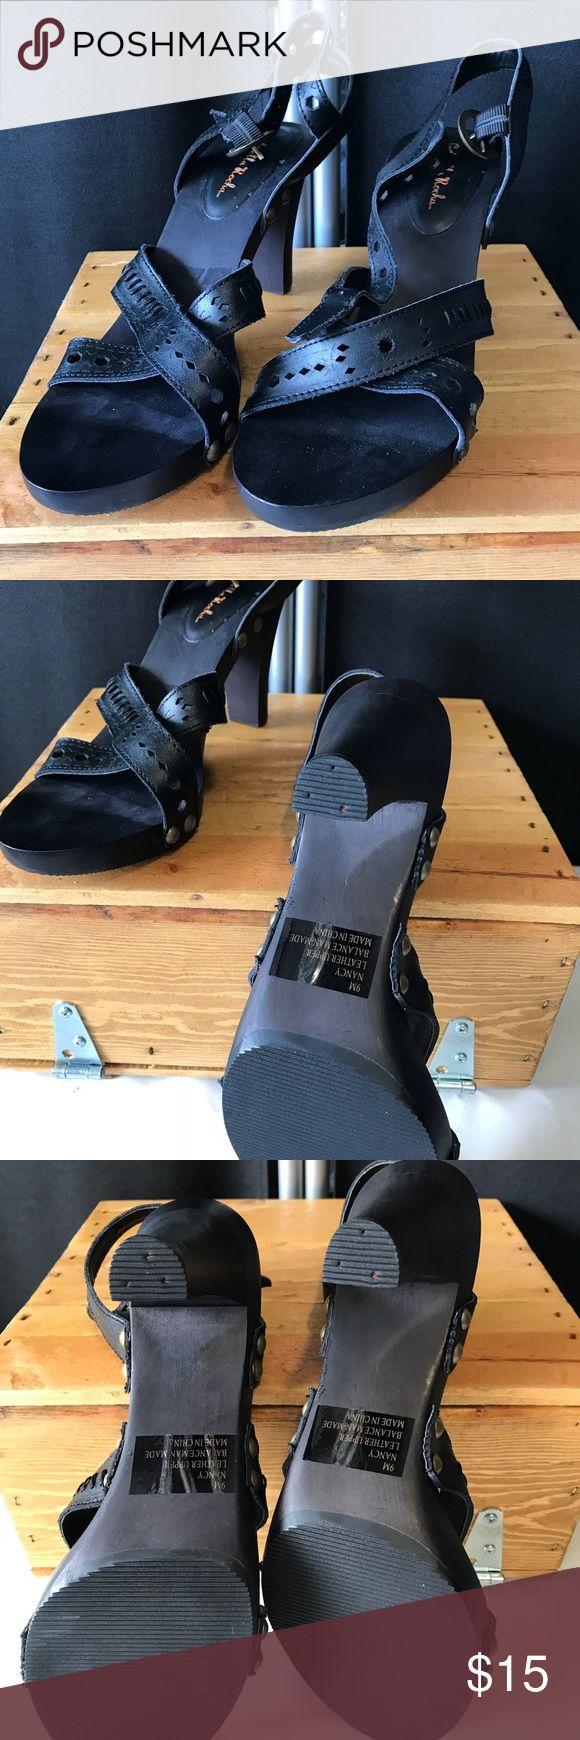 Size 9 Gabriella Rocha Excellent condition like new gabriella rocha Shoes Heels